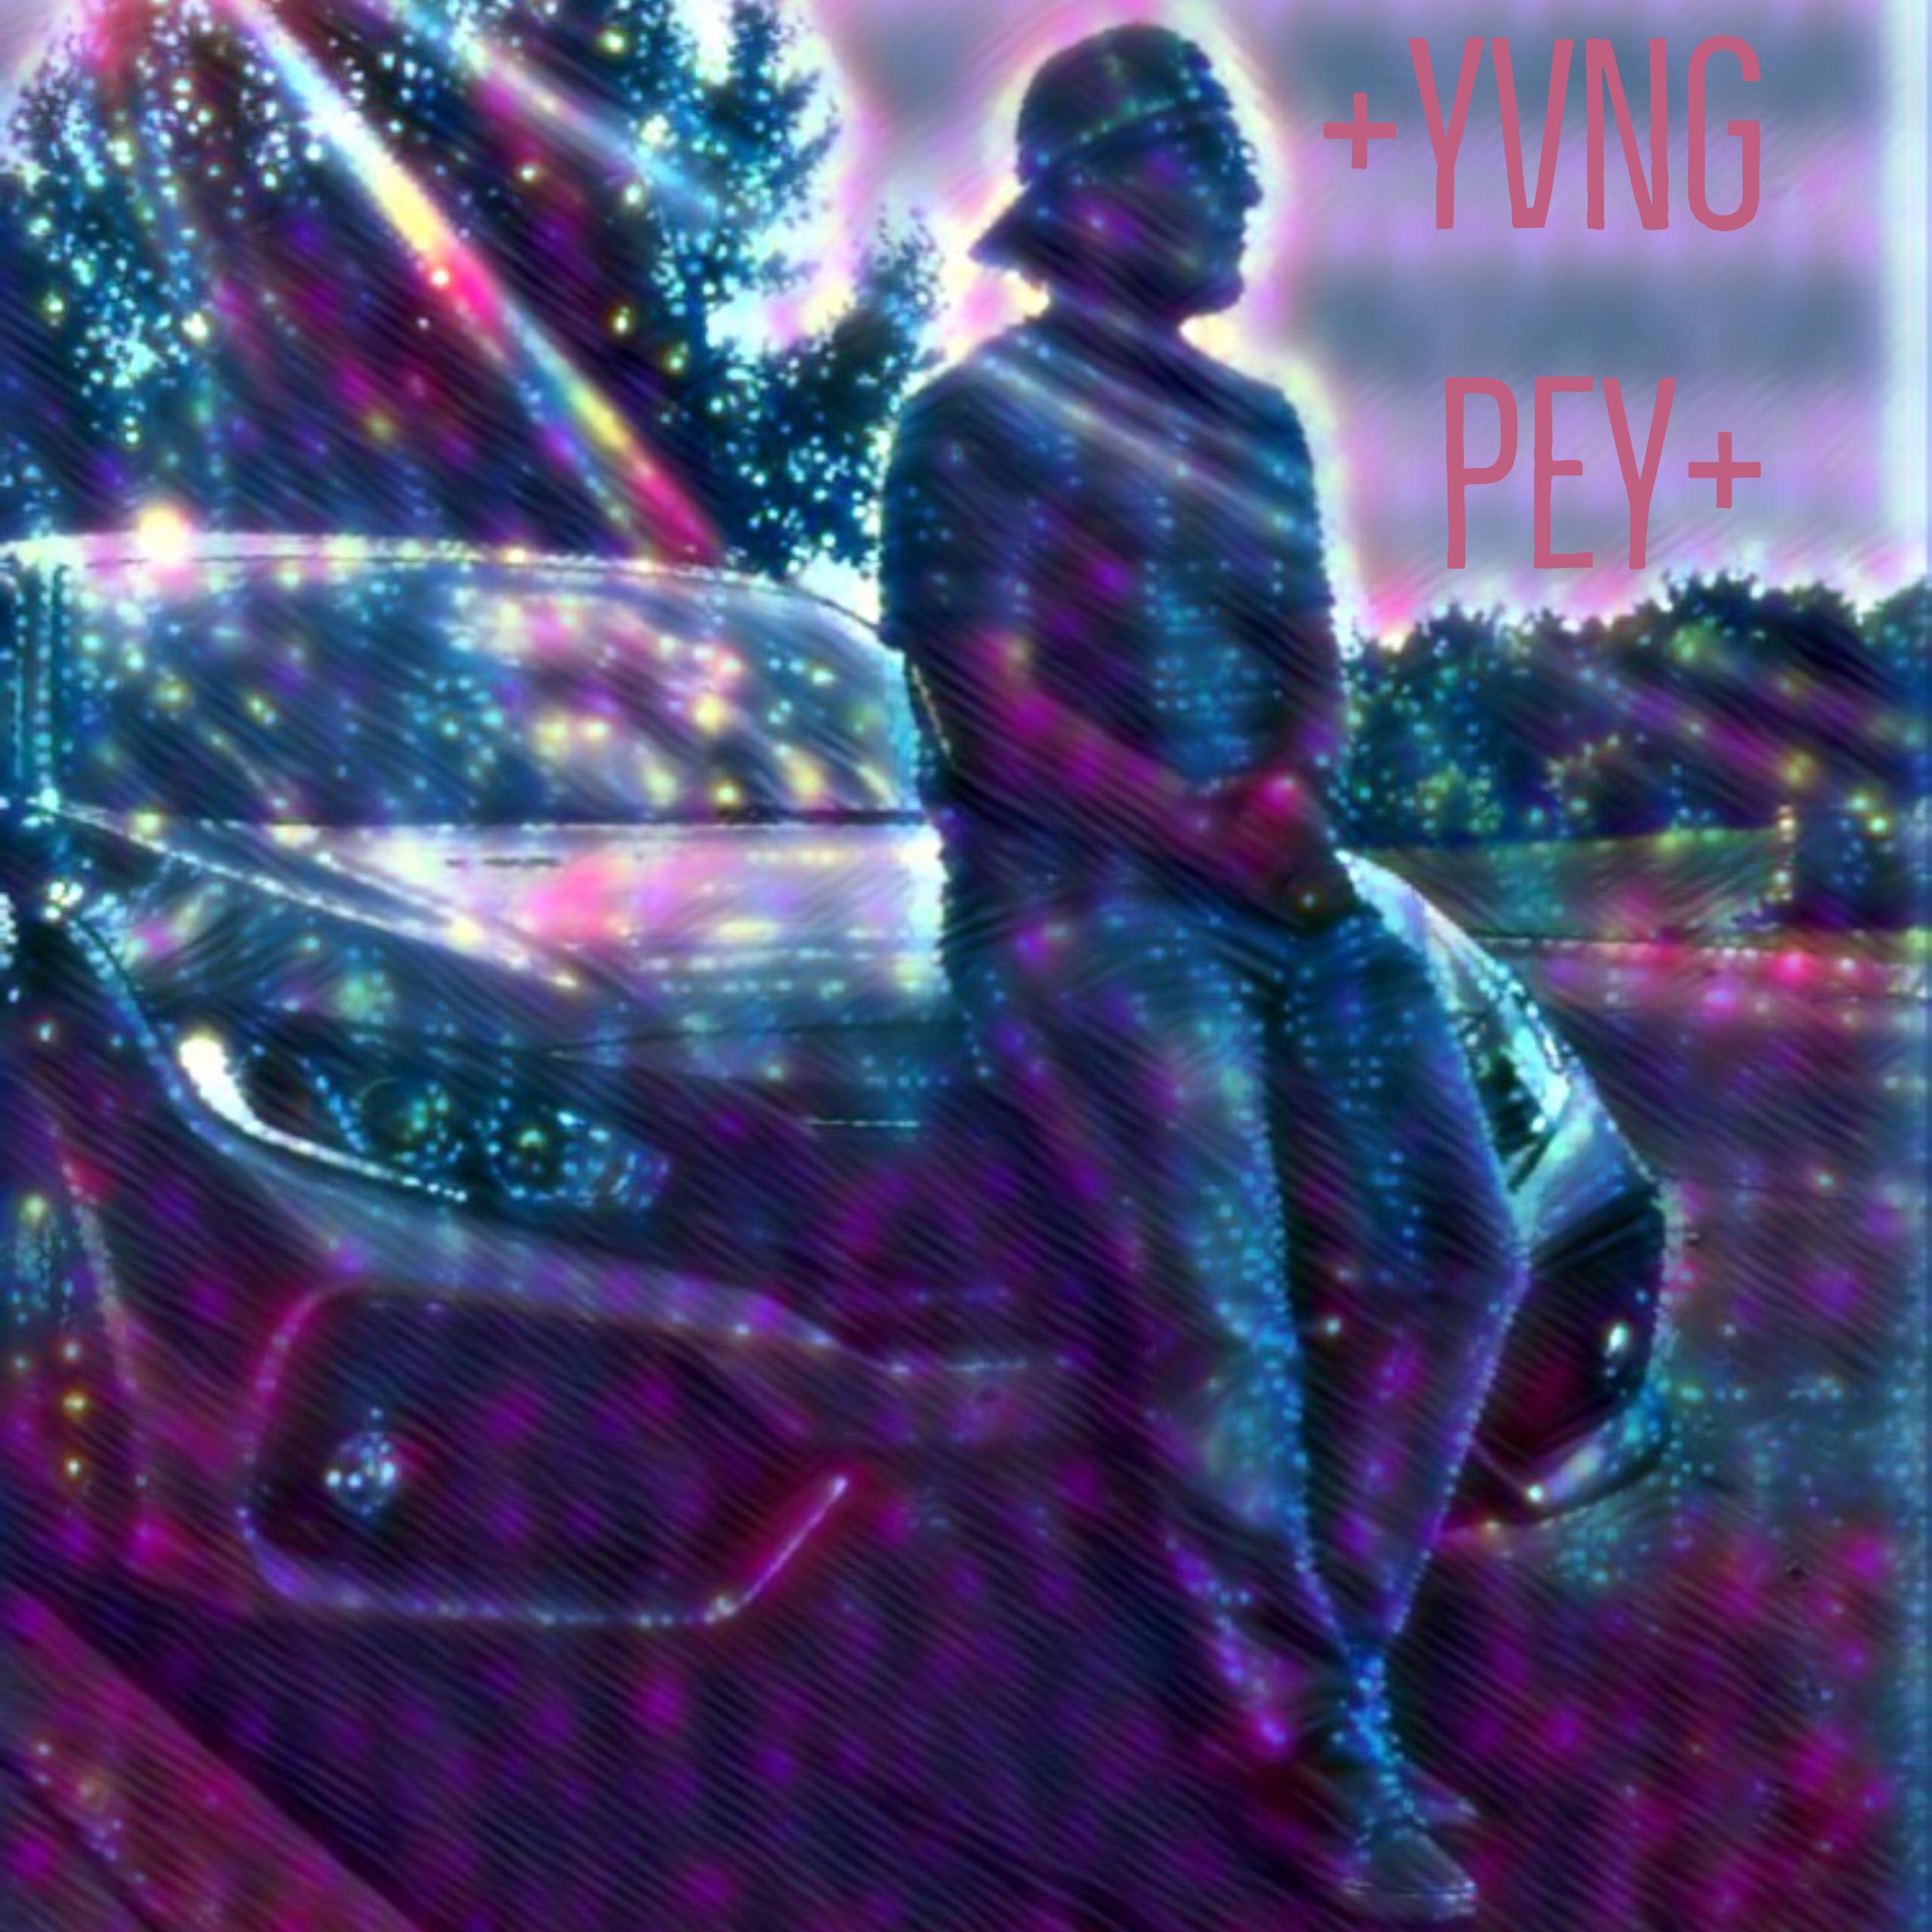 +Yvng Pey+ - Cali Girls